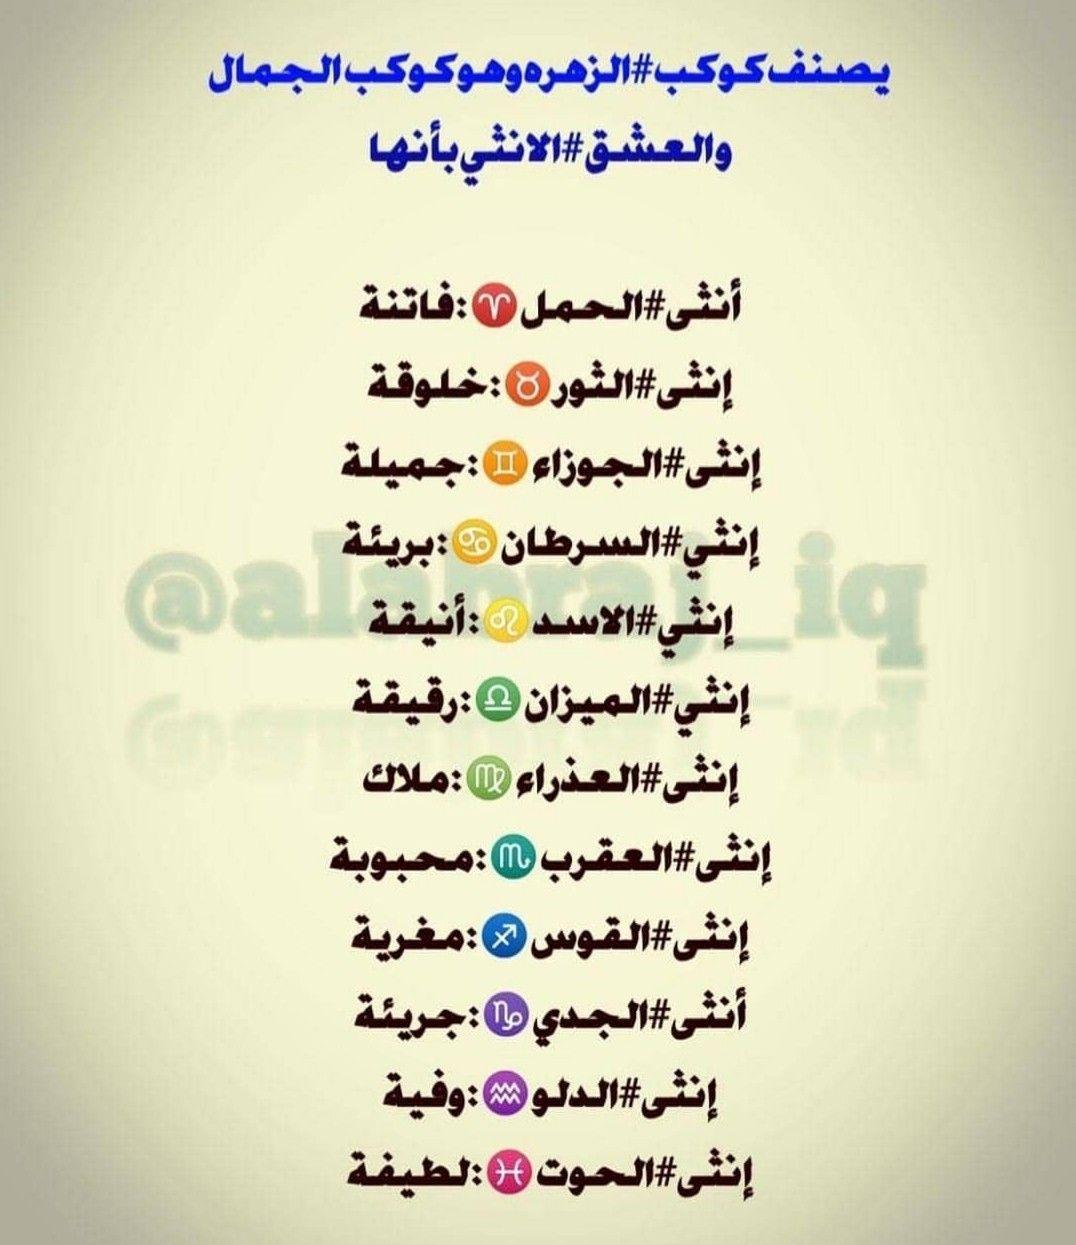 Pin By Mayar On الأبراج Iphone Wallpaper Quotes Love Wallpaper Iphone Quotes Wallpaper Quotes